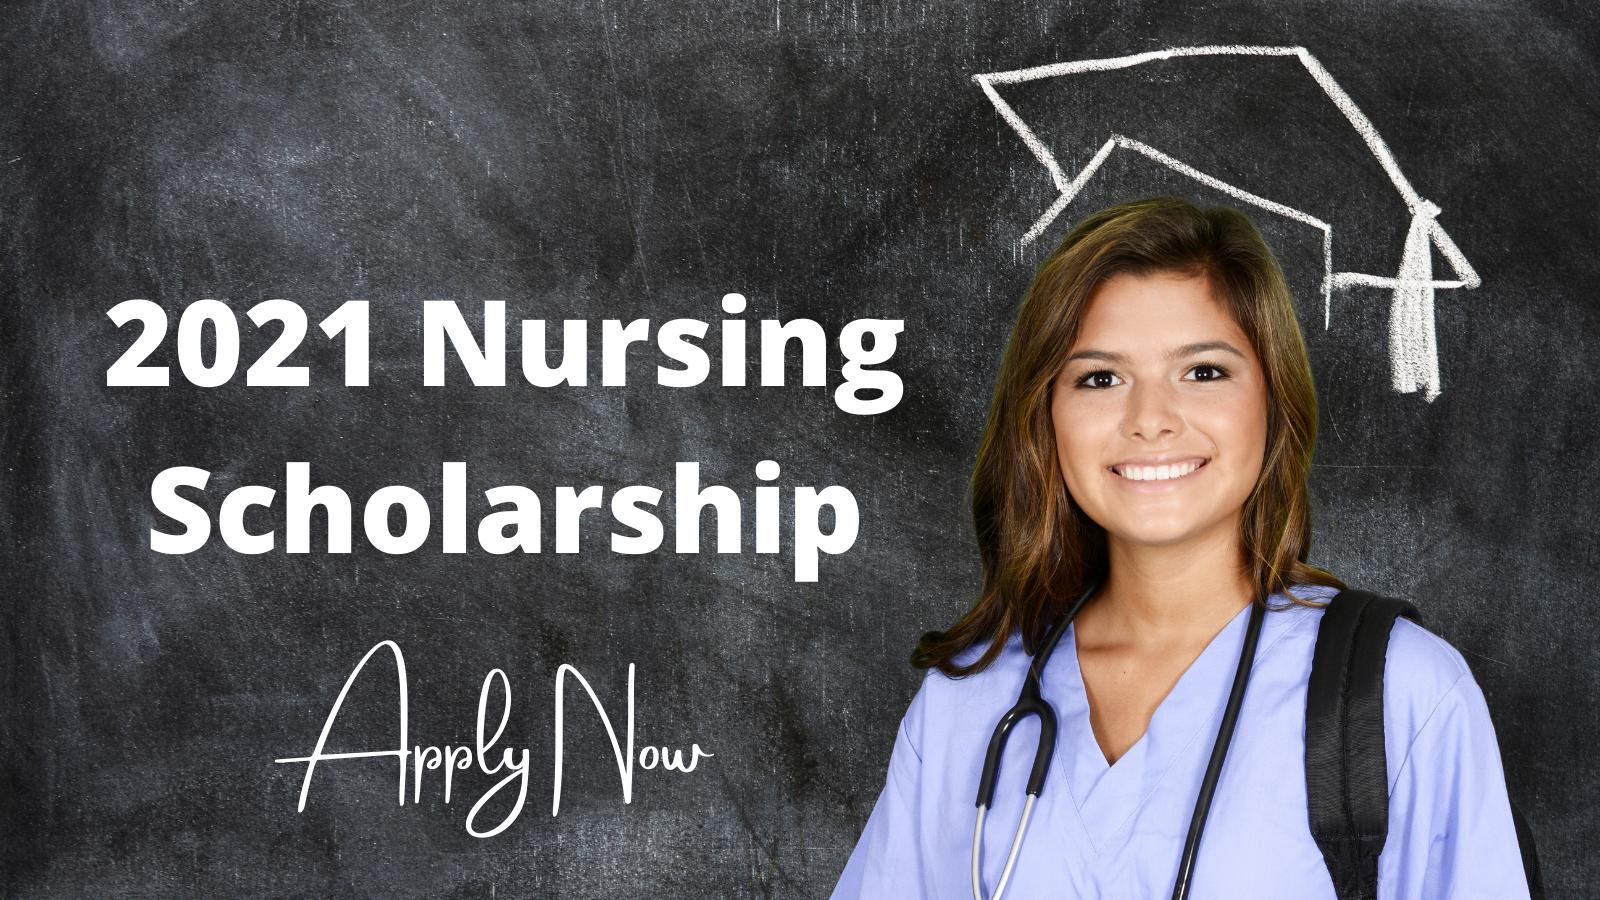 2021 Nursing Scholarship Application Period Now Open